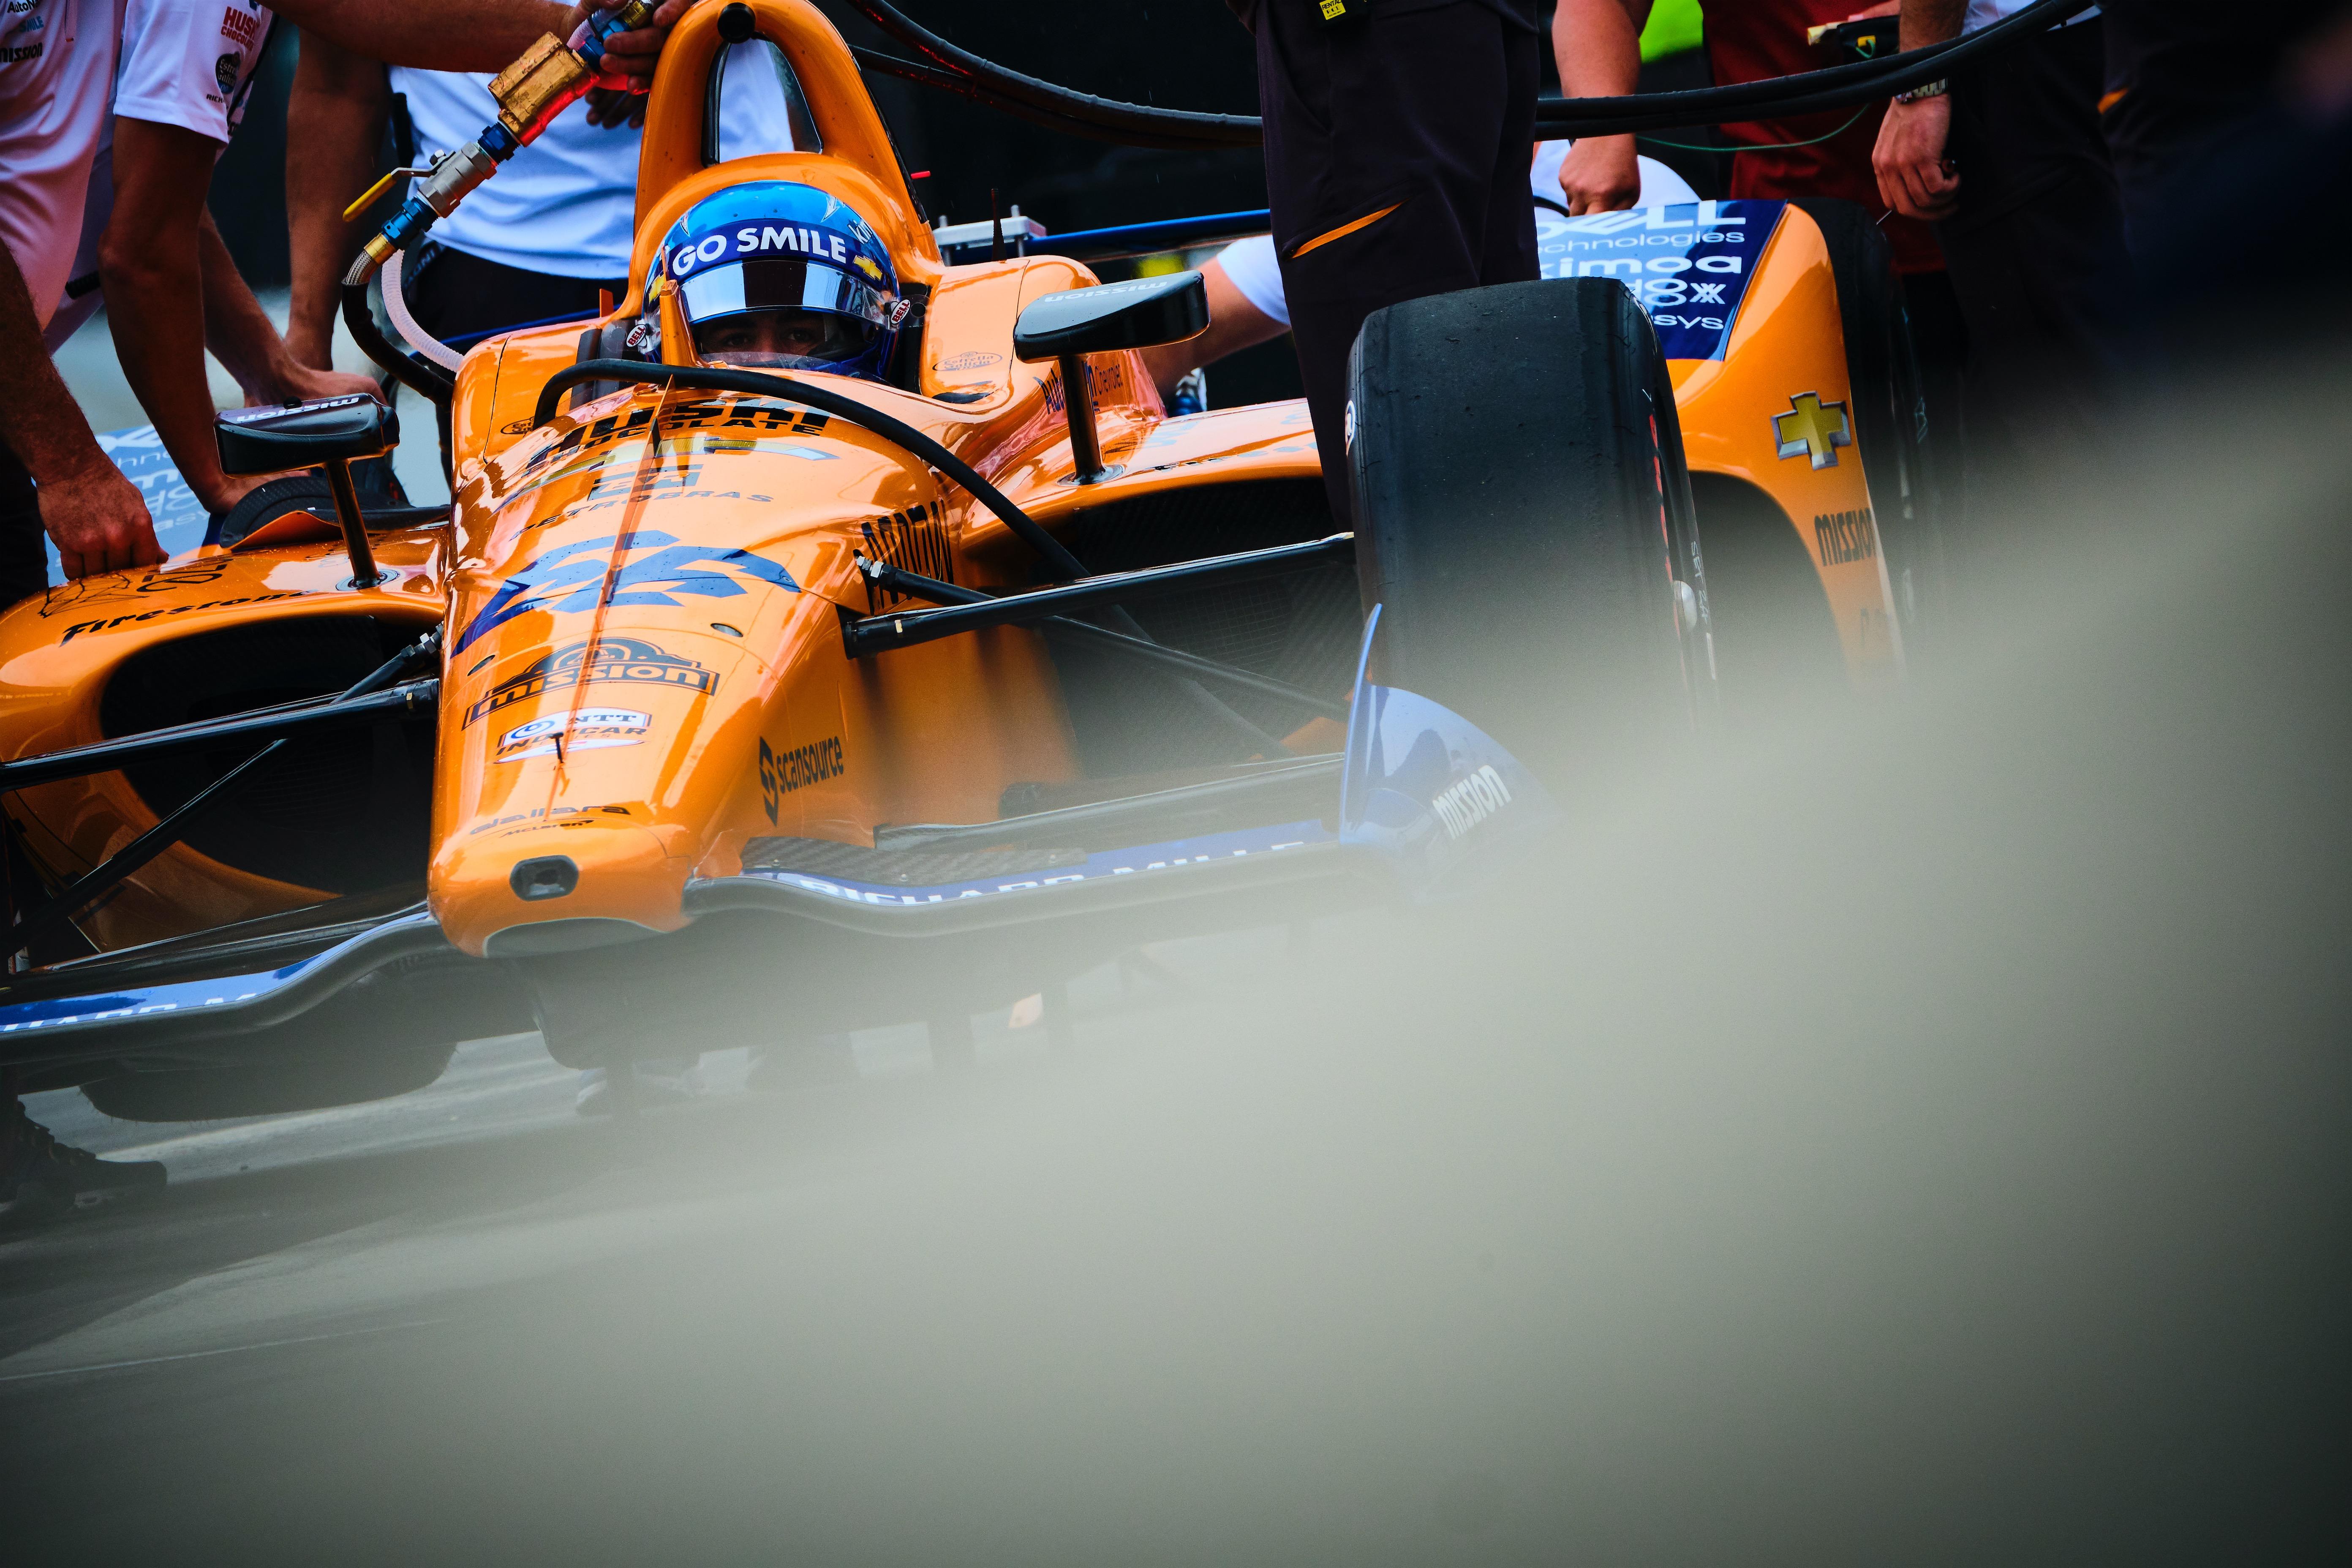 Fernando Alonso Indianapolis 500 2019